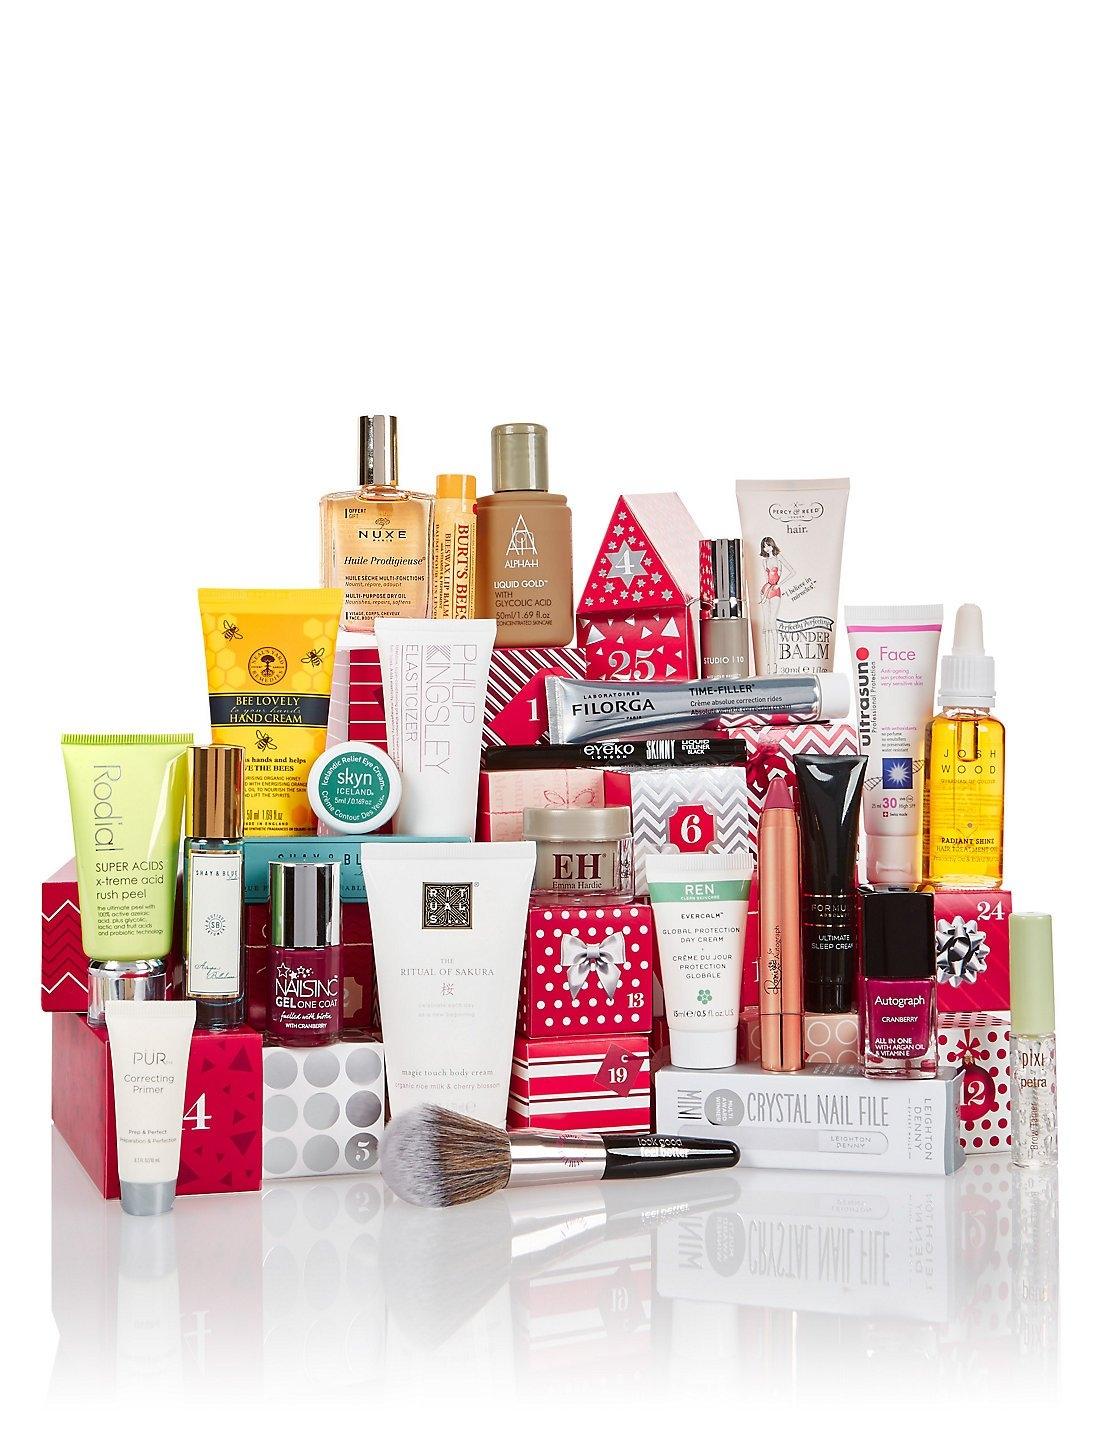 M&s Beauty Advent Calendar – £35 When You Spend £35+   2019 Diy How M&s Calendar 2019